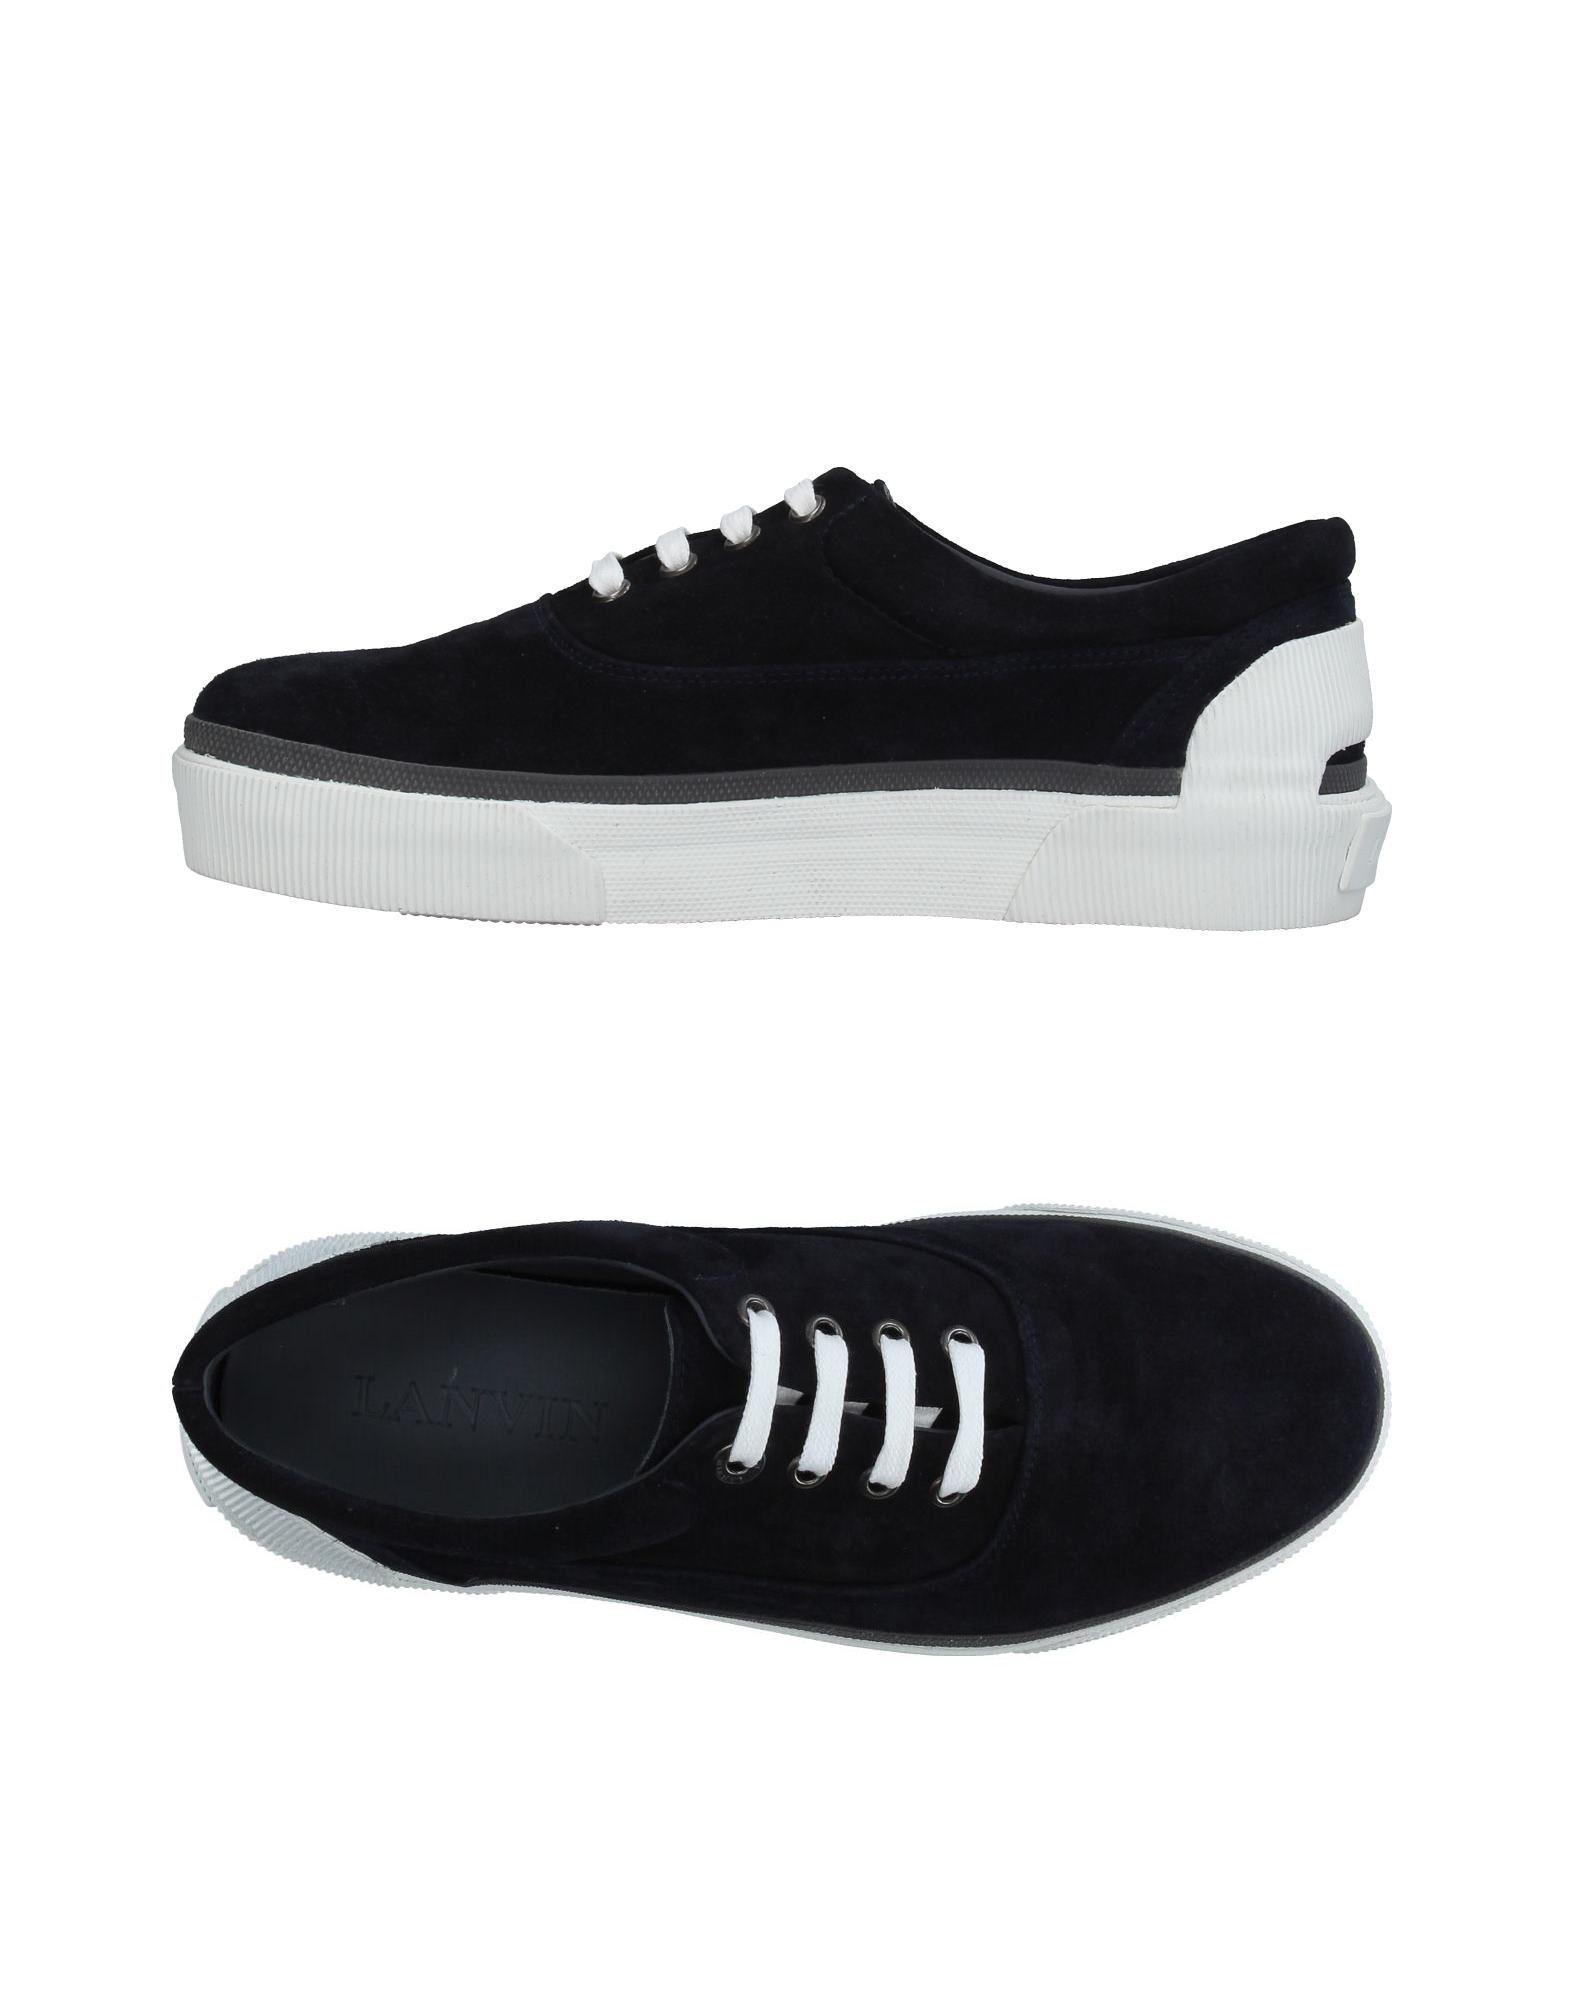 Lanvin Sneakers Herren  11263471ED Gute Qualität beliebte Schuhe